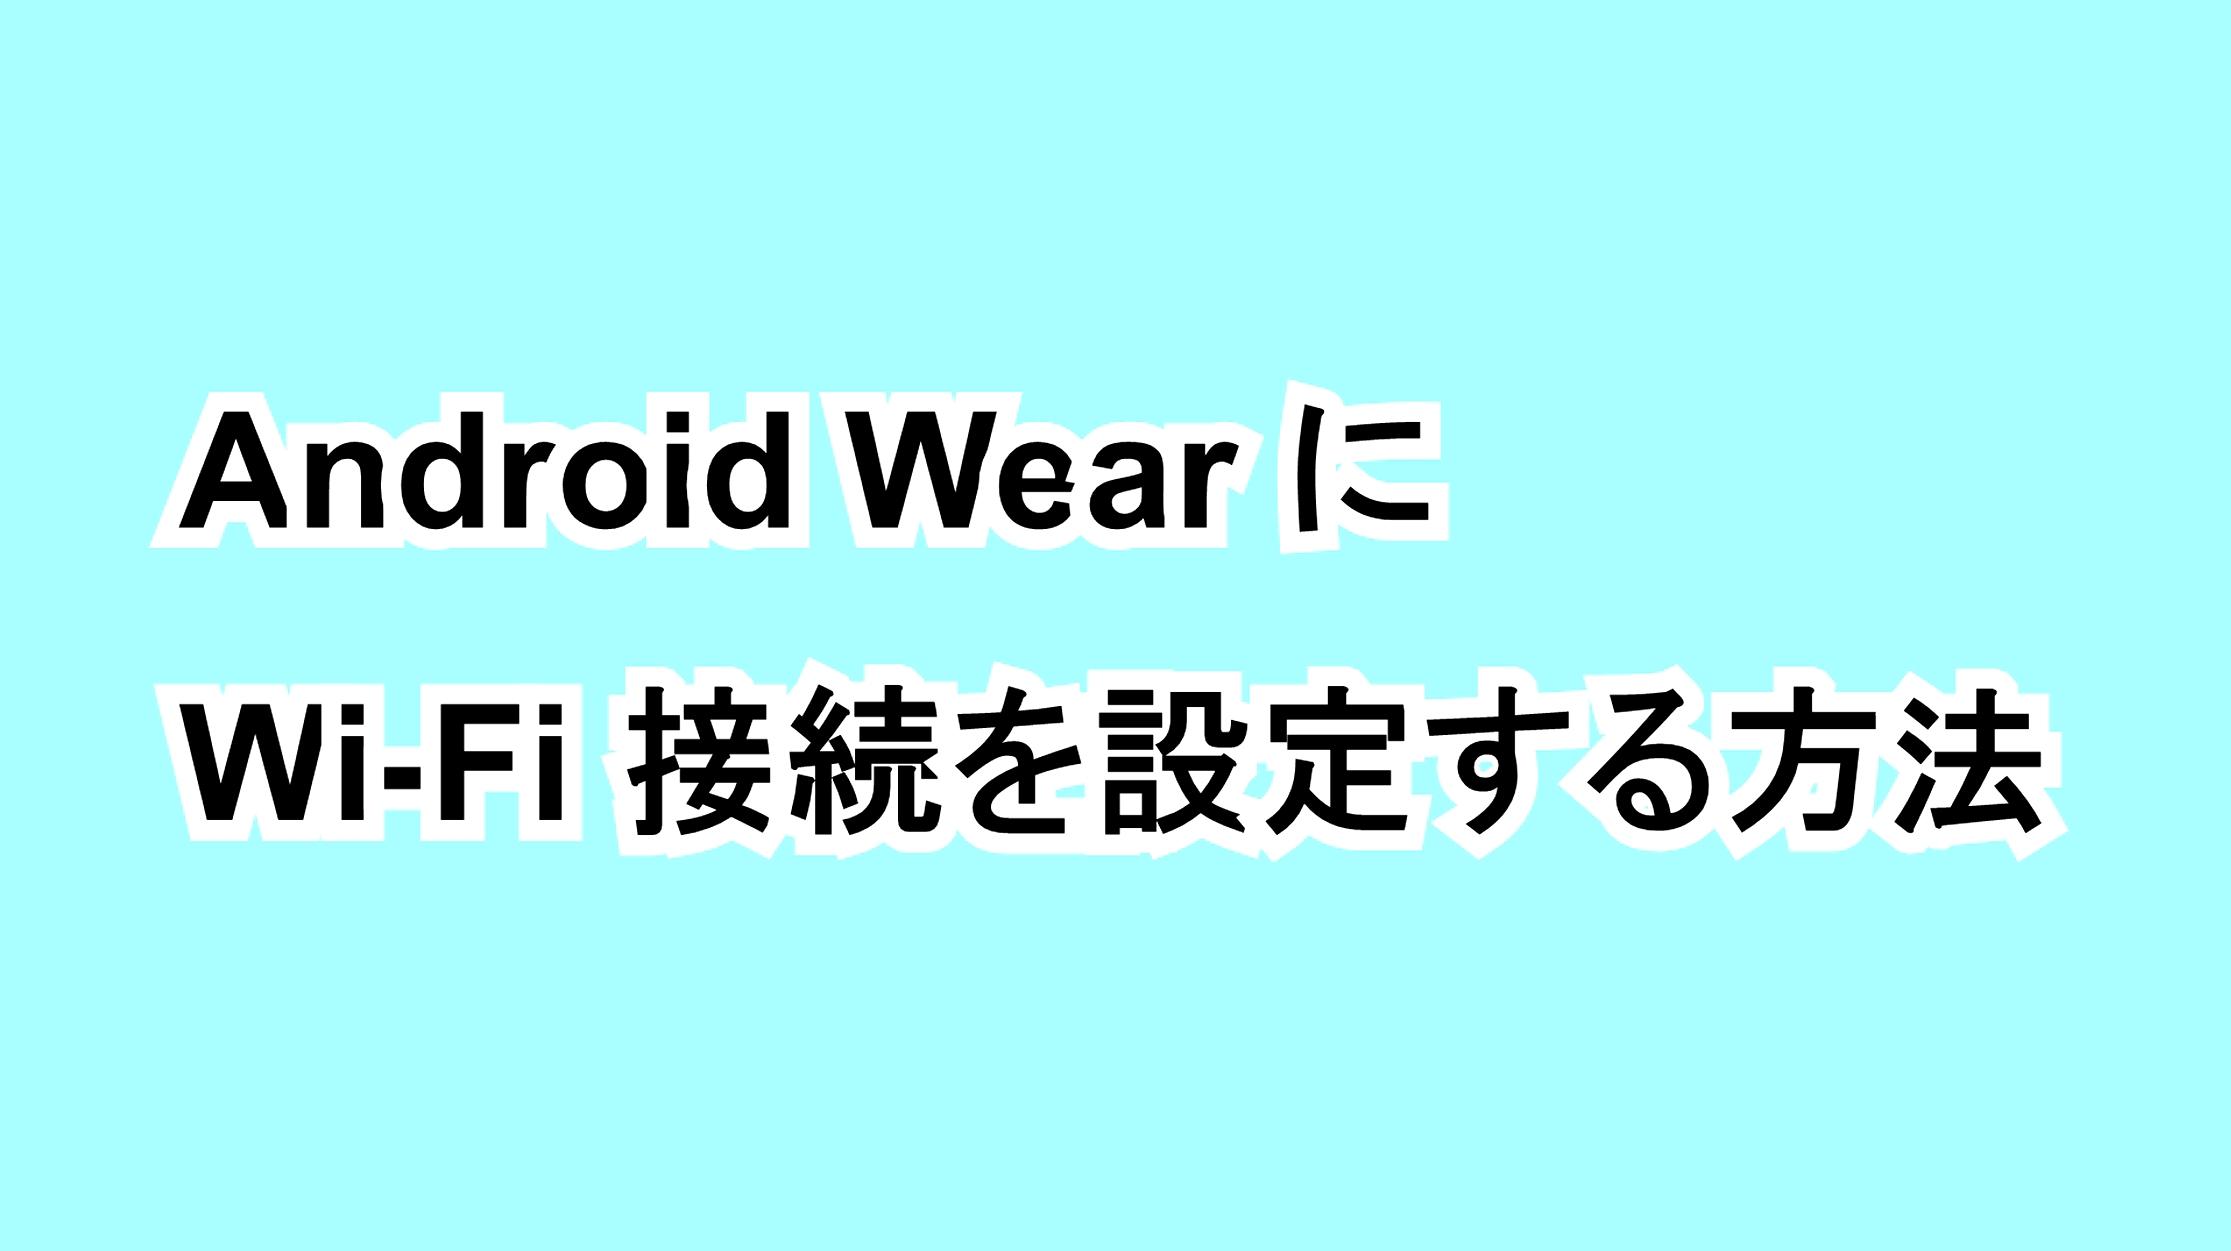 Android WearにWi-Fi接続を設定する方法